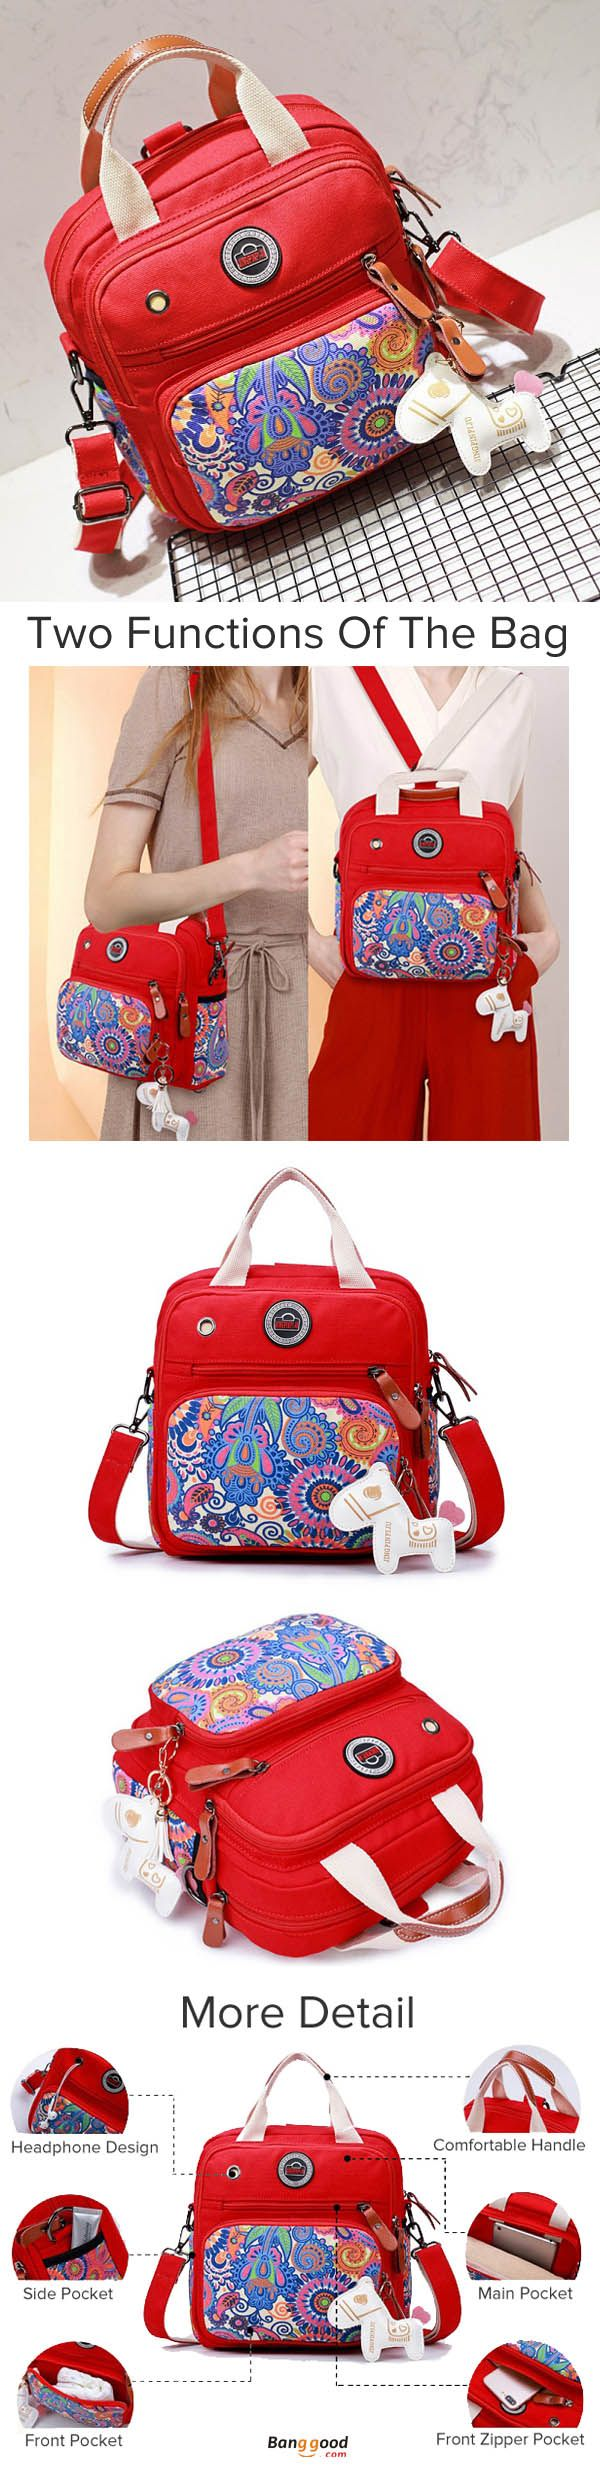 US$26.17+Free shipping. Women Bags, Waterproof Crossbody Bags, Casual Bags, Chest Bags, Multifunction Handbag, Backpack, Shoulder Bags. Function, Travel, Outdoor, Waterproof, Large Capacity. Color: Black, Red.